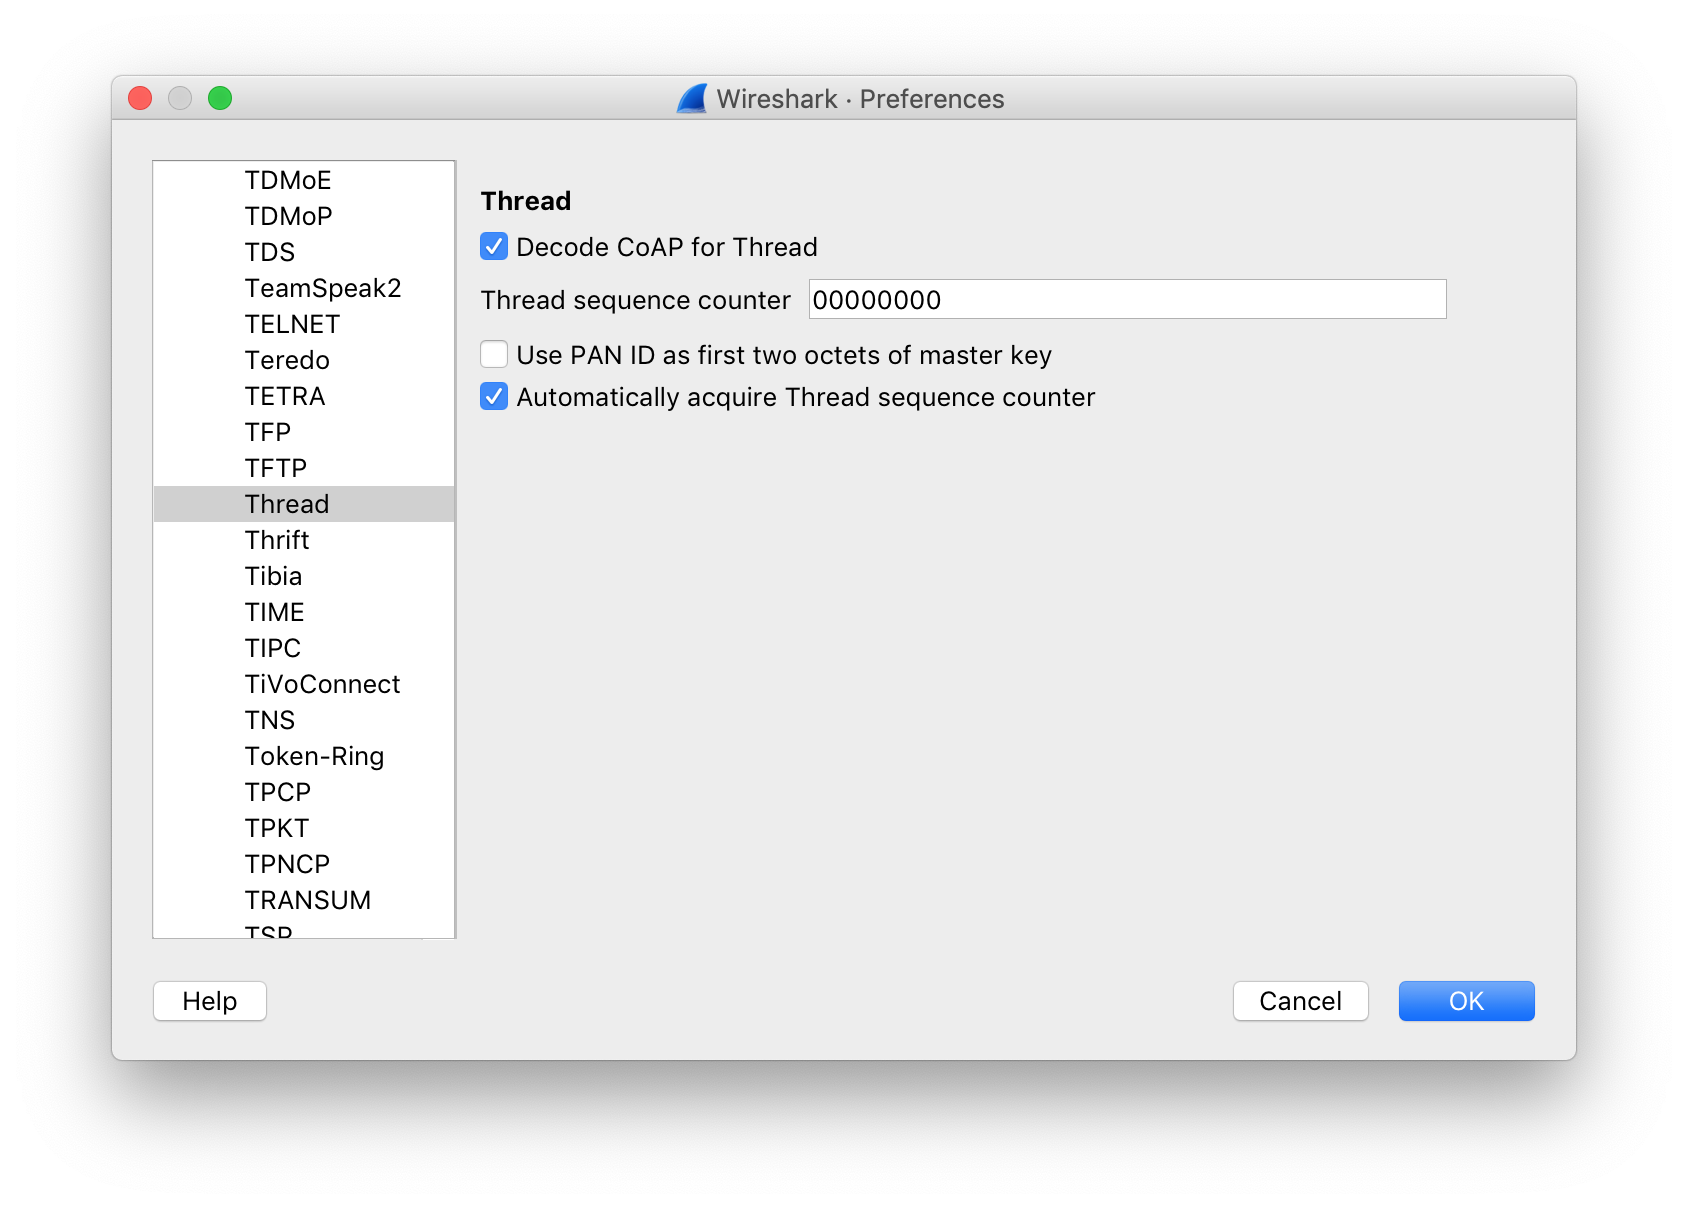 Thread Network Sniffer - Grove Mesh Kit Documentation